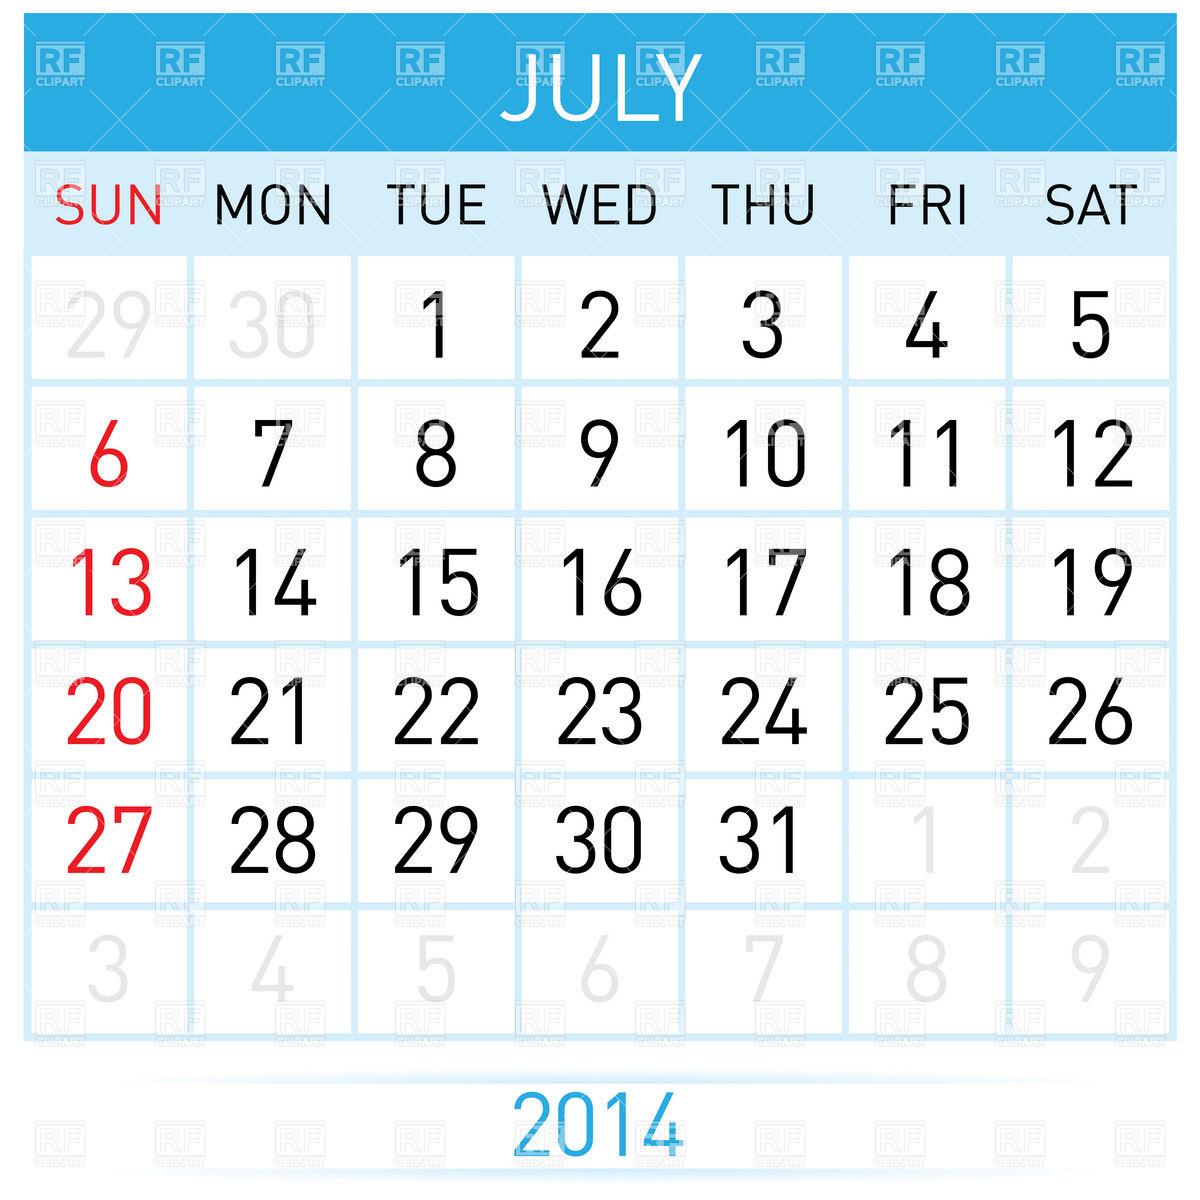 Calendar clipart july graphic transparent download July Calendar Clipart - Clipart Kid graphic transparent download